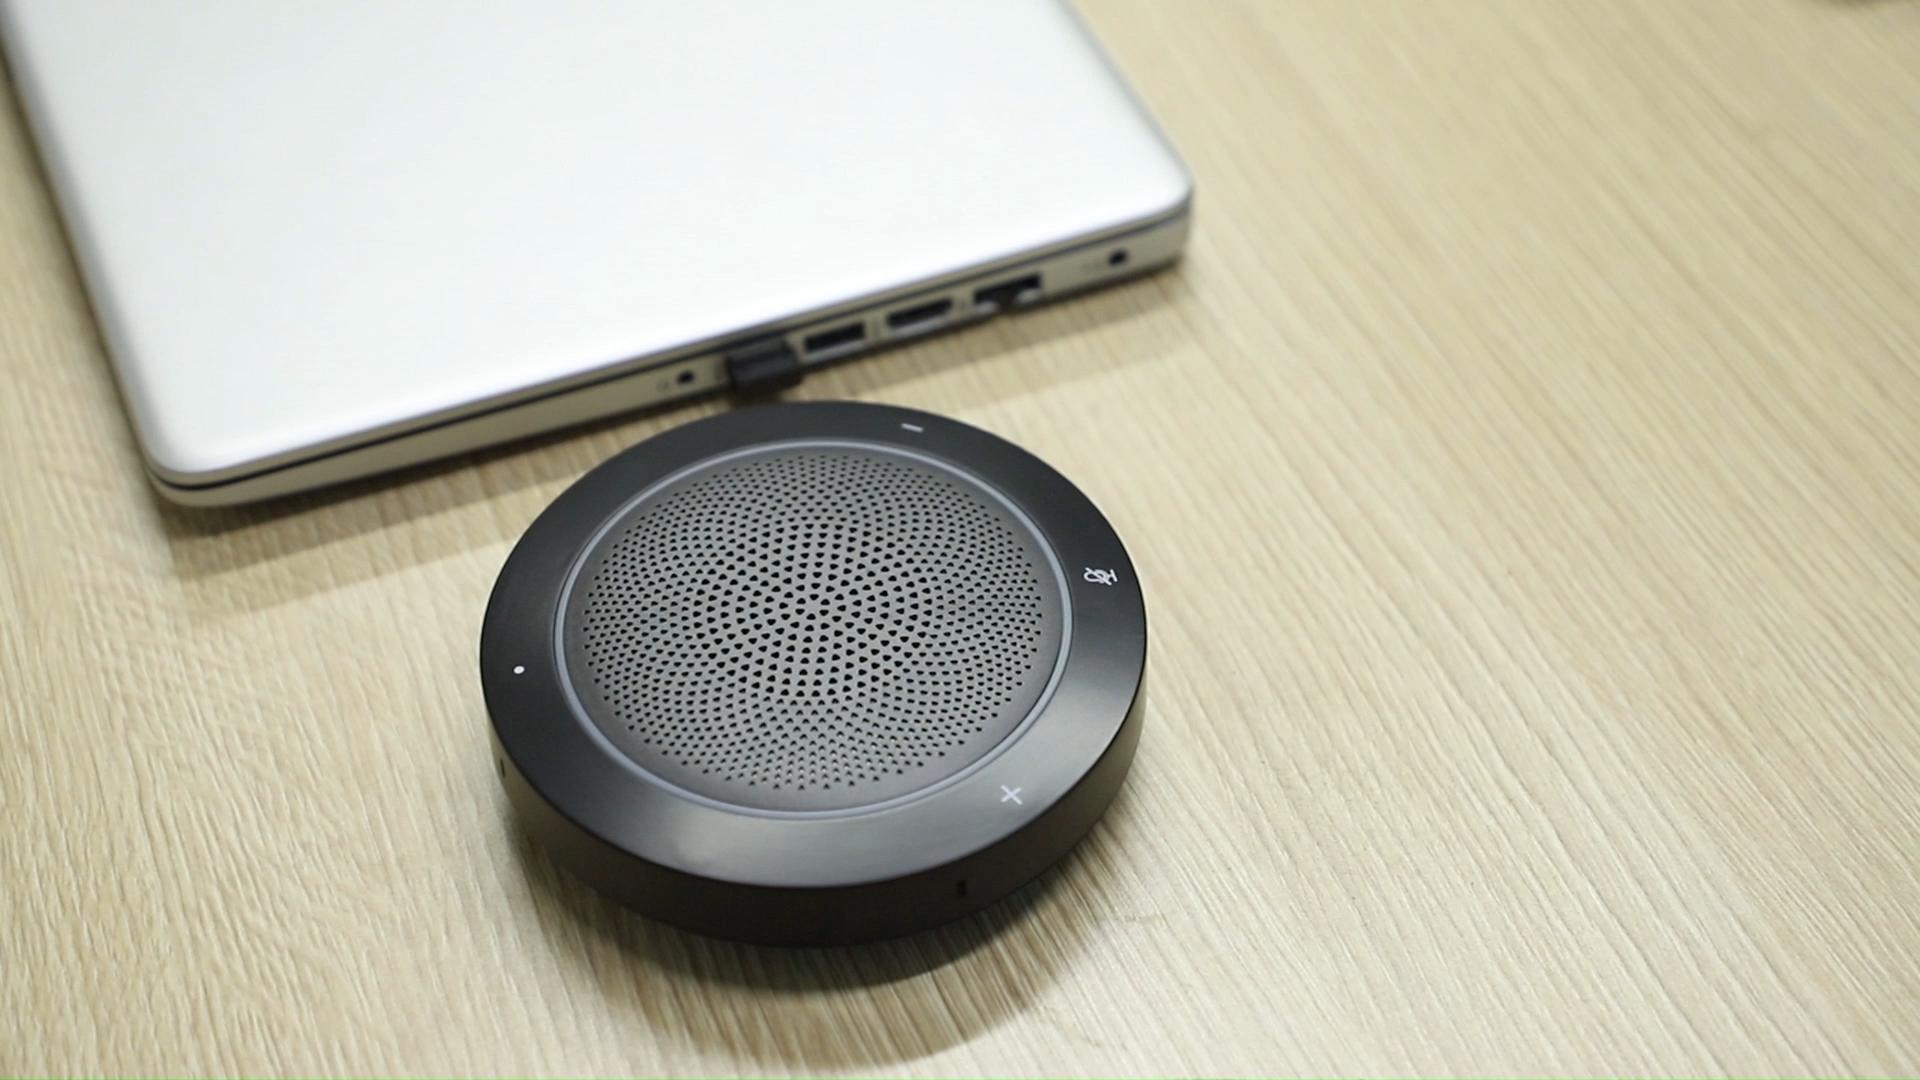 kaysuda SP200U Mini Speakerphone for skype conference speak